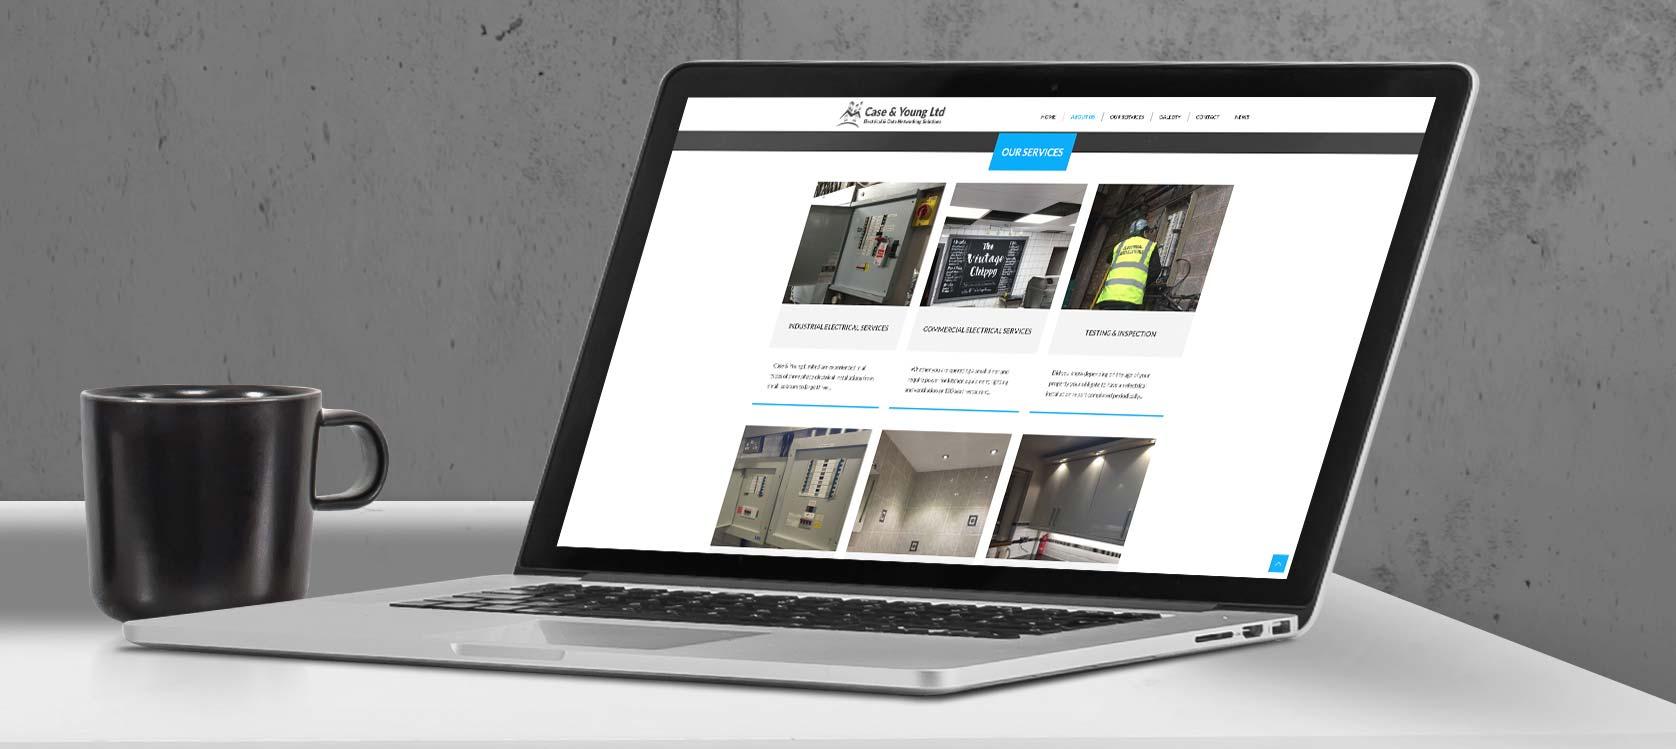 Case & Young Ltd   Responsive Website Design